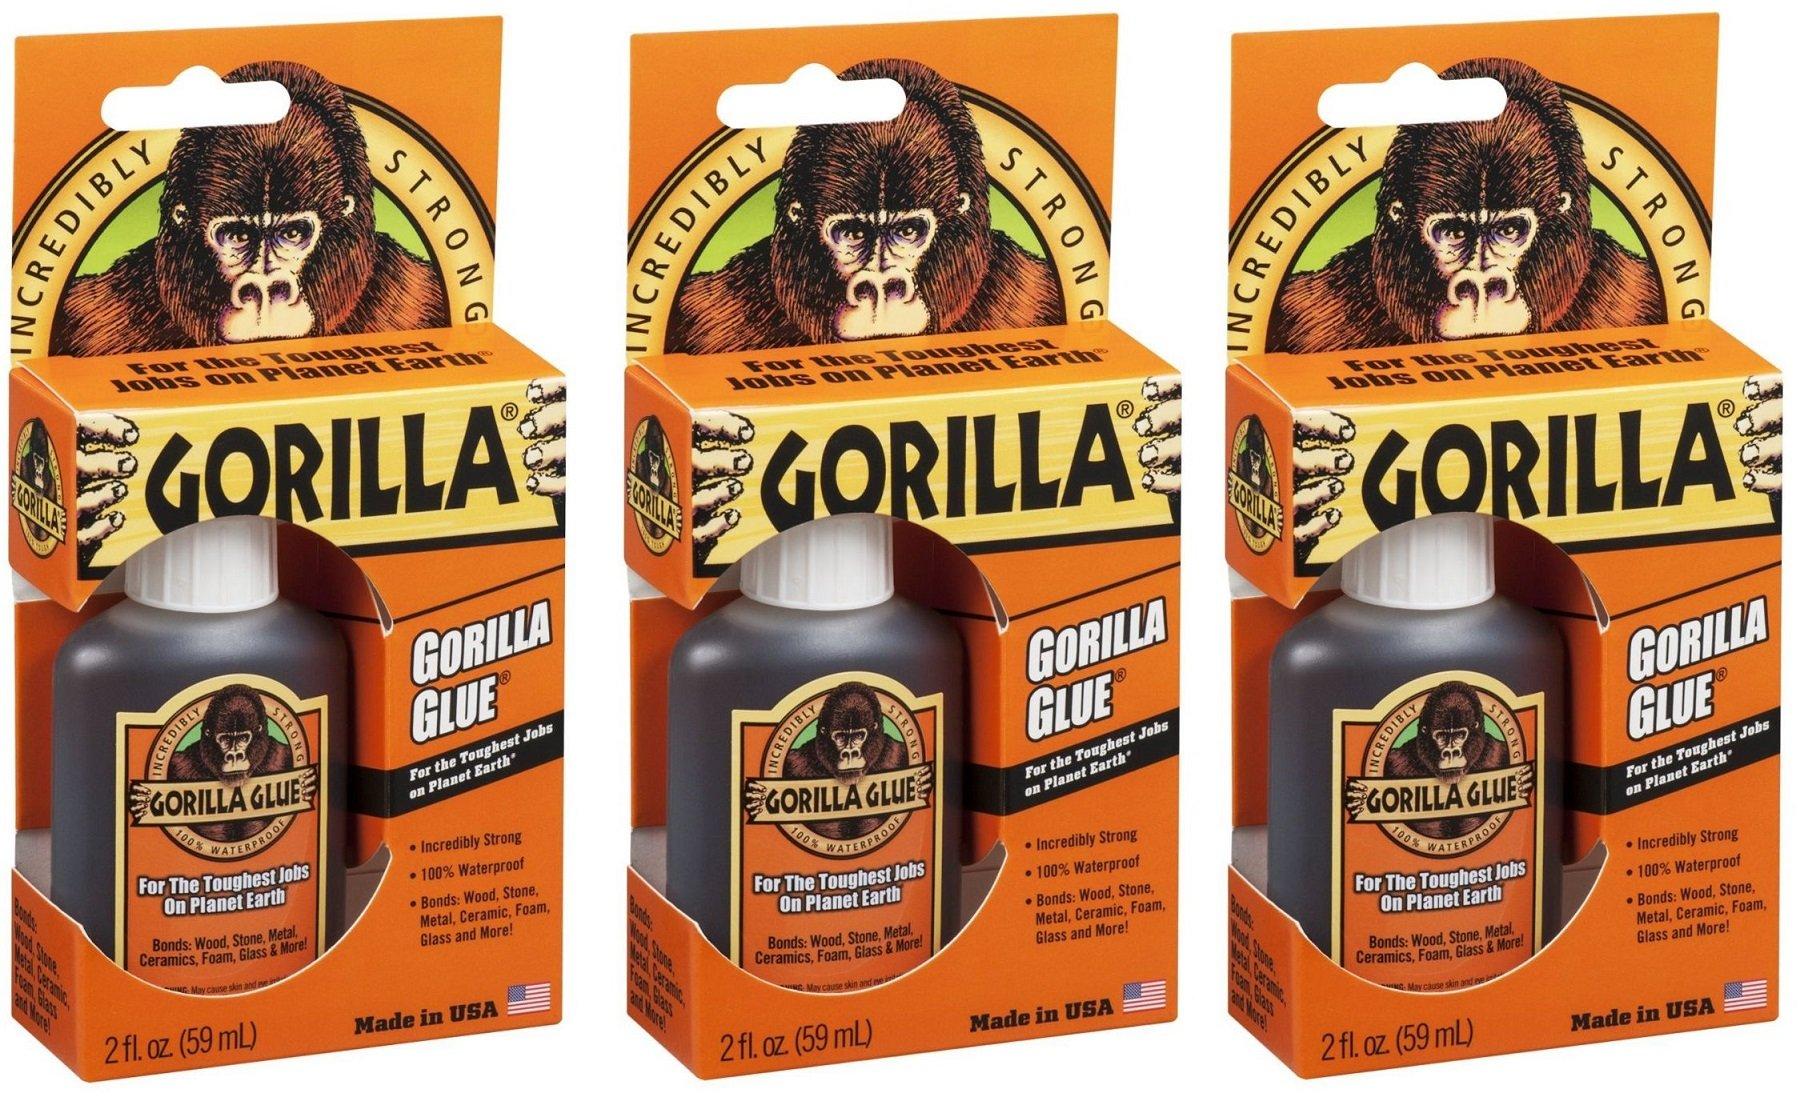 Original Gorilla Glue 2 Ounces (Pack of 3)